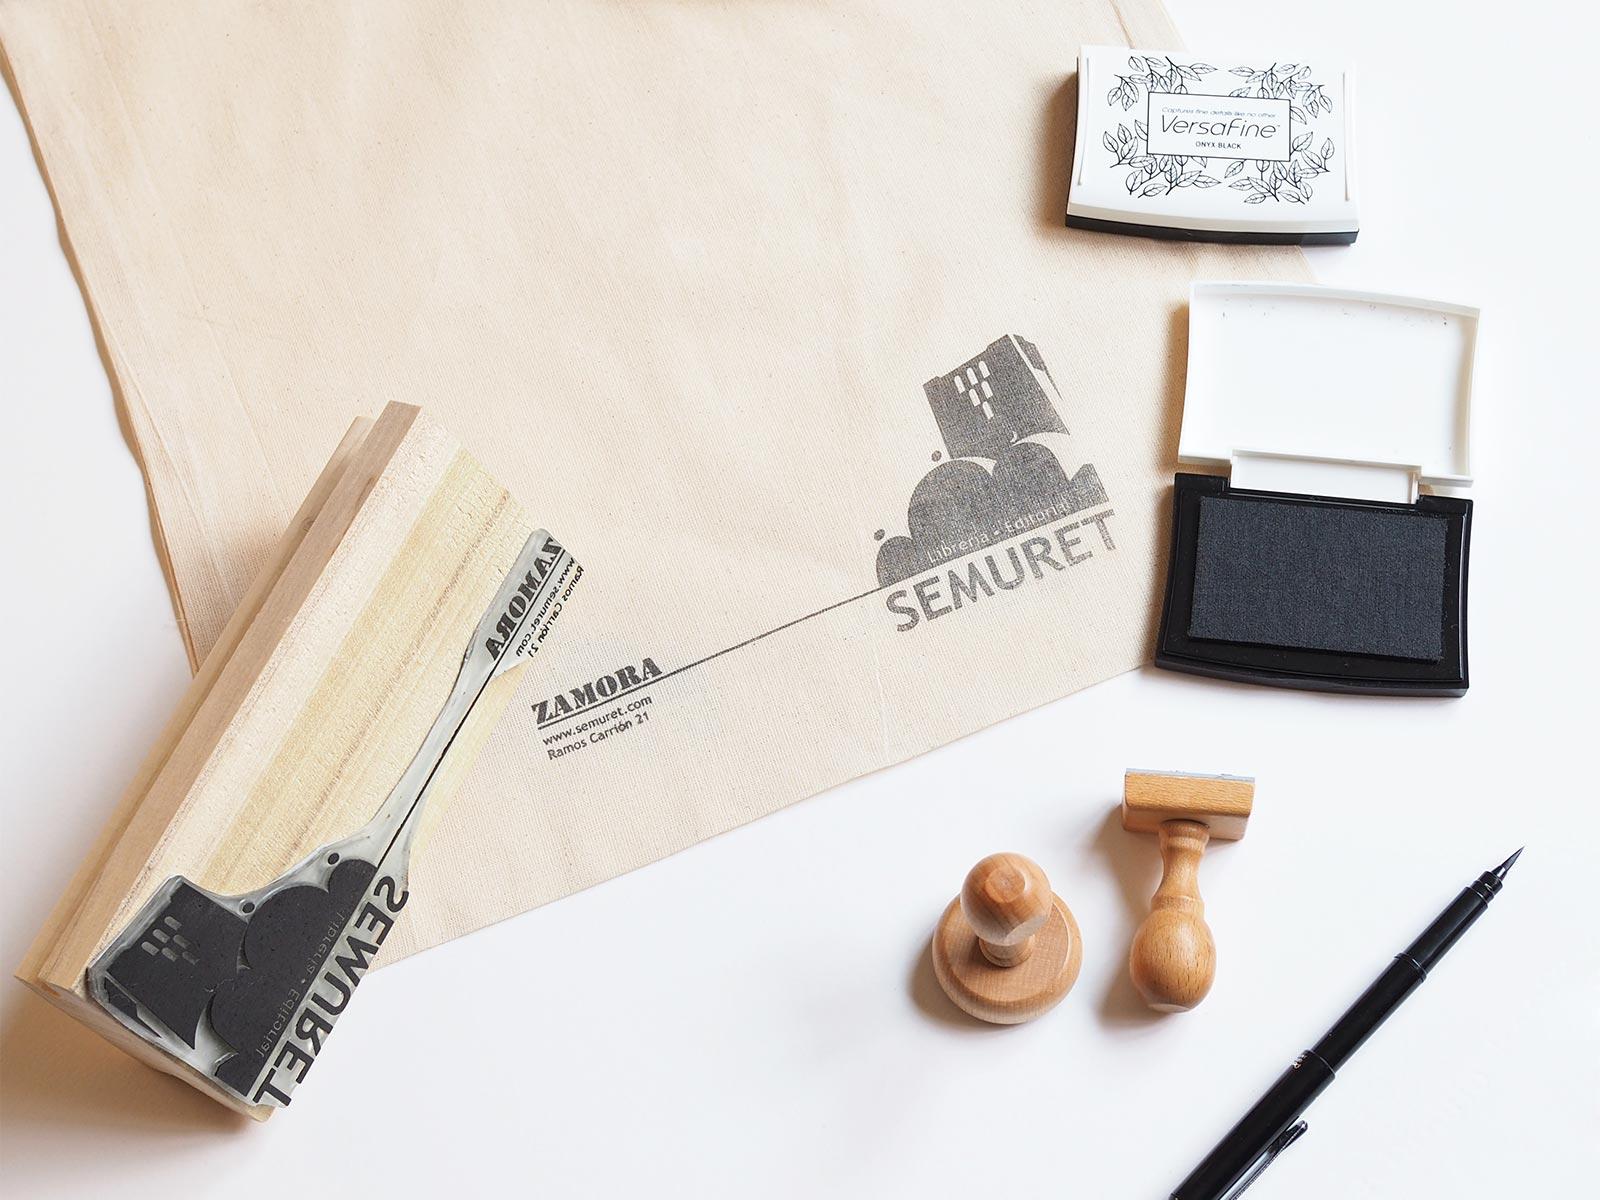 branding print identidad corporativa ink tote bag librería editorial Semuret Zamora henkawebs henkaarquitectos